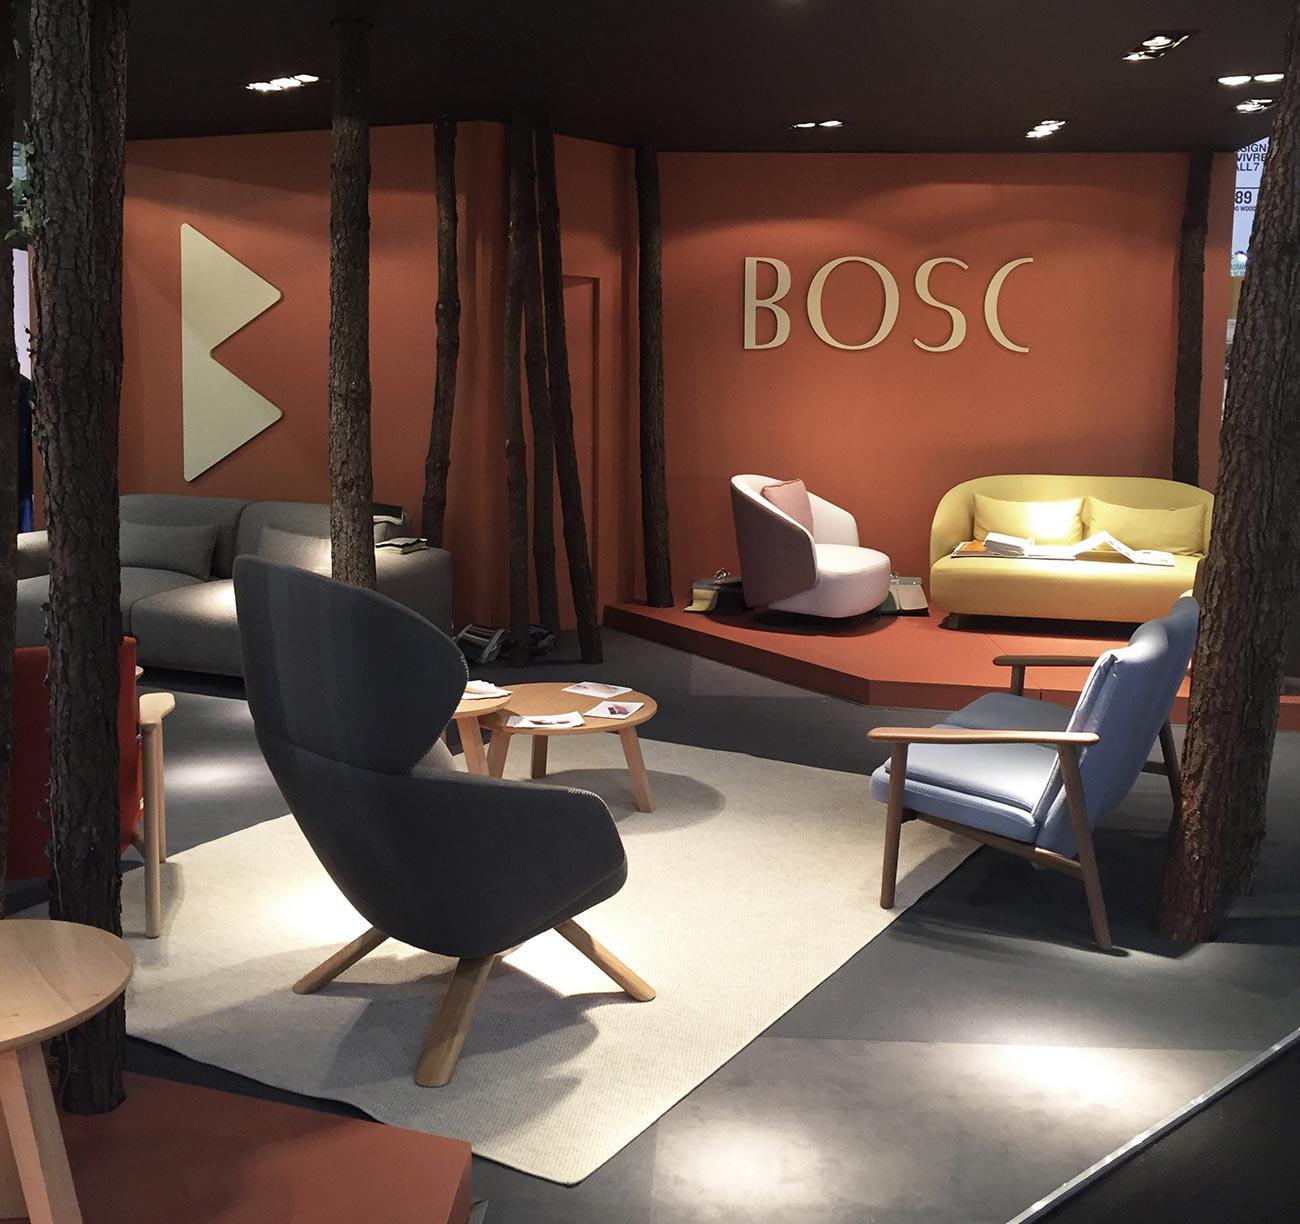 Sofa-Manufacturer-Bosc-Stand-MO17